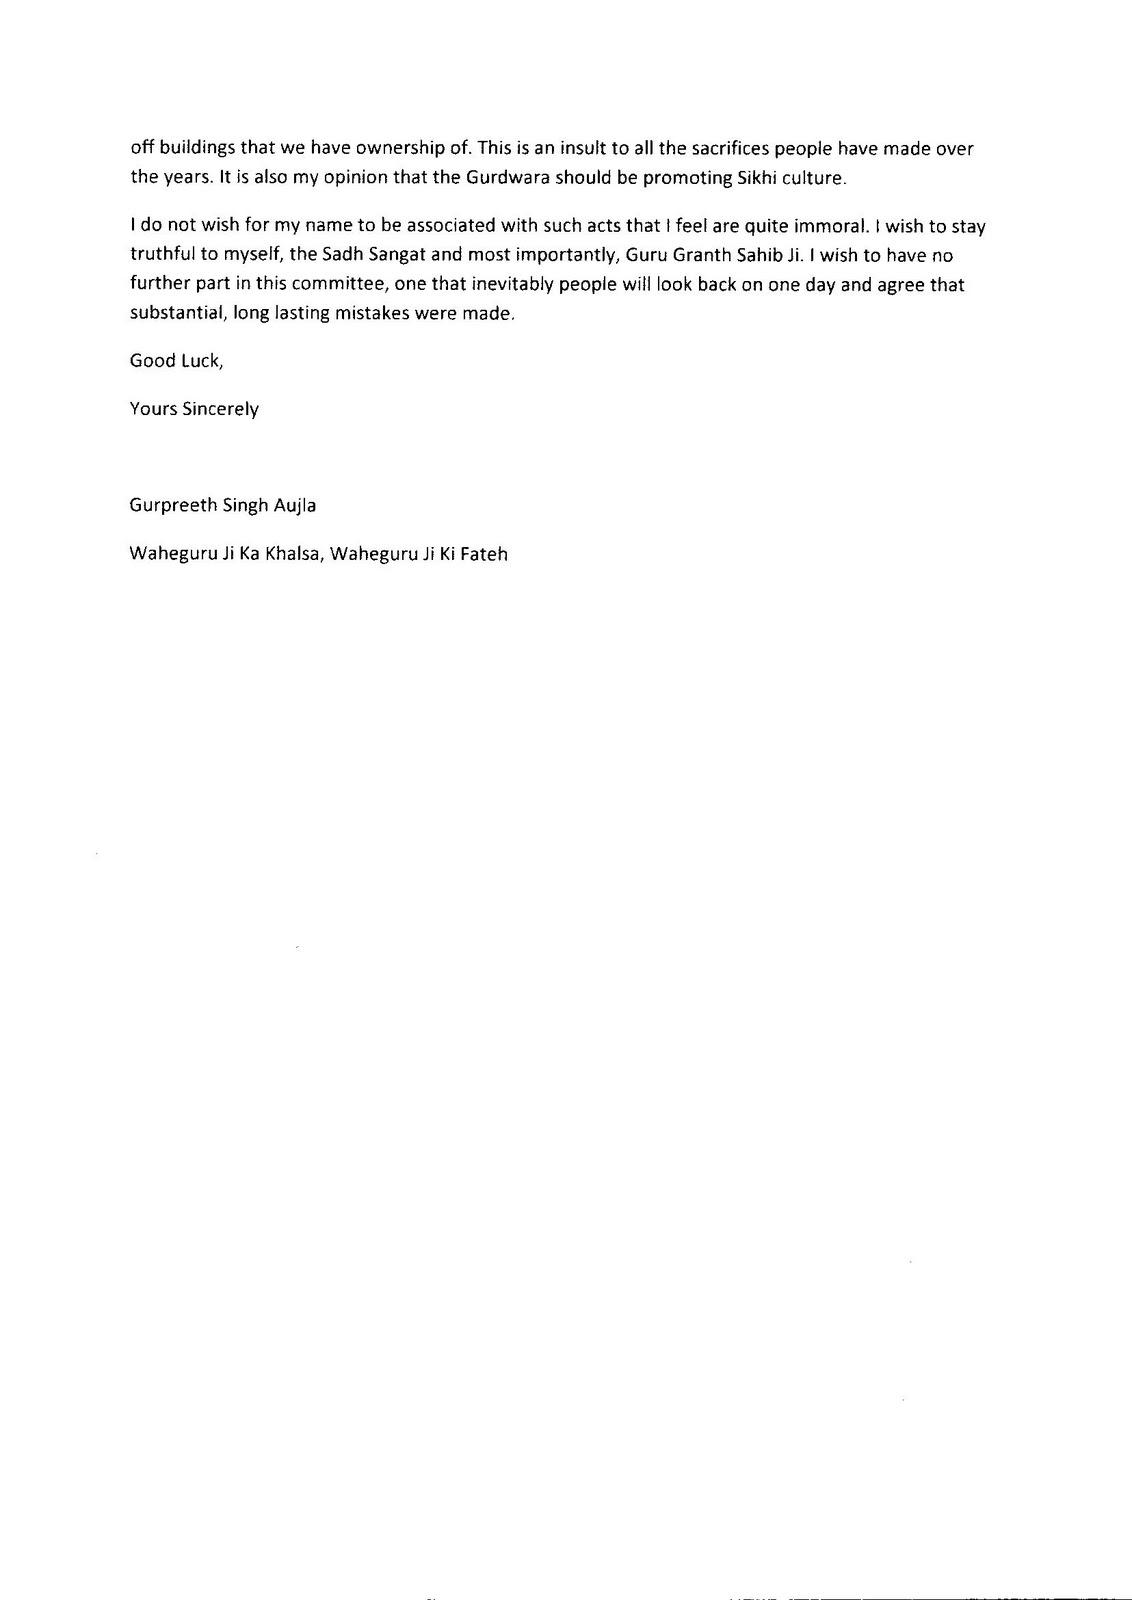 Exhibit 2 U2013 Resignation Letter (from Sikhsangat.com Discussion Thread)